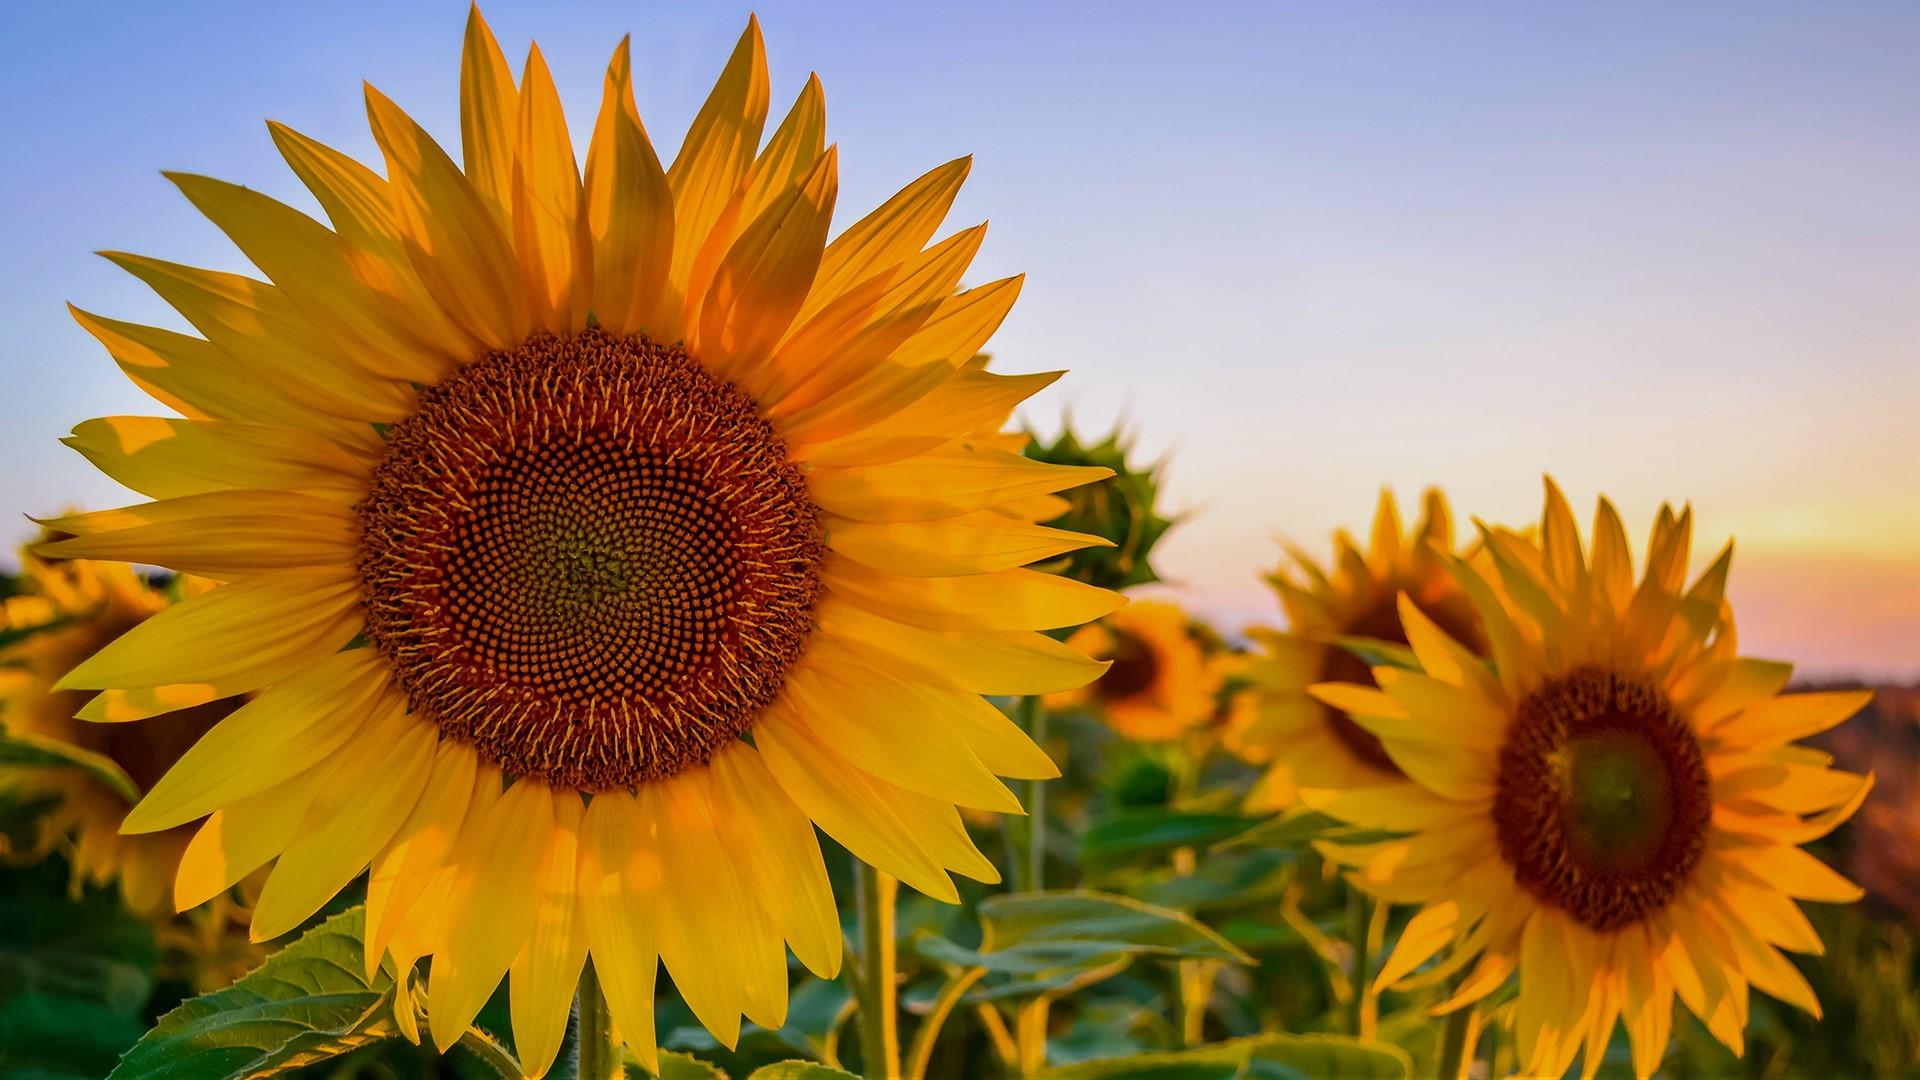 Sunflower at sunset | Windows 10 SpotLight Images